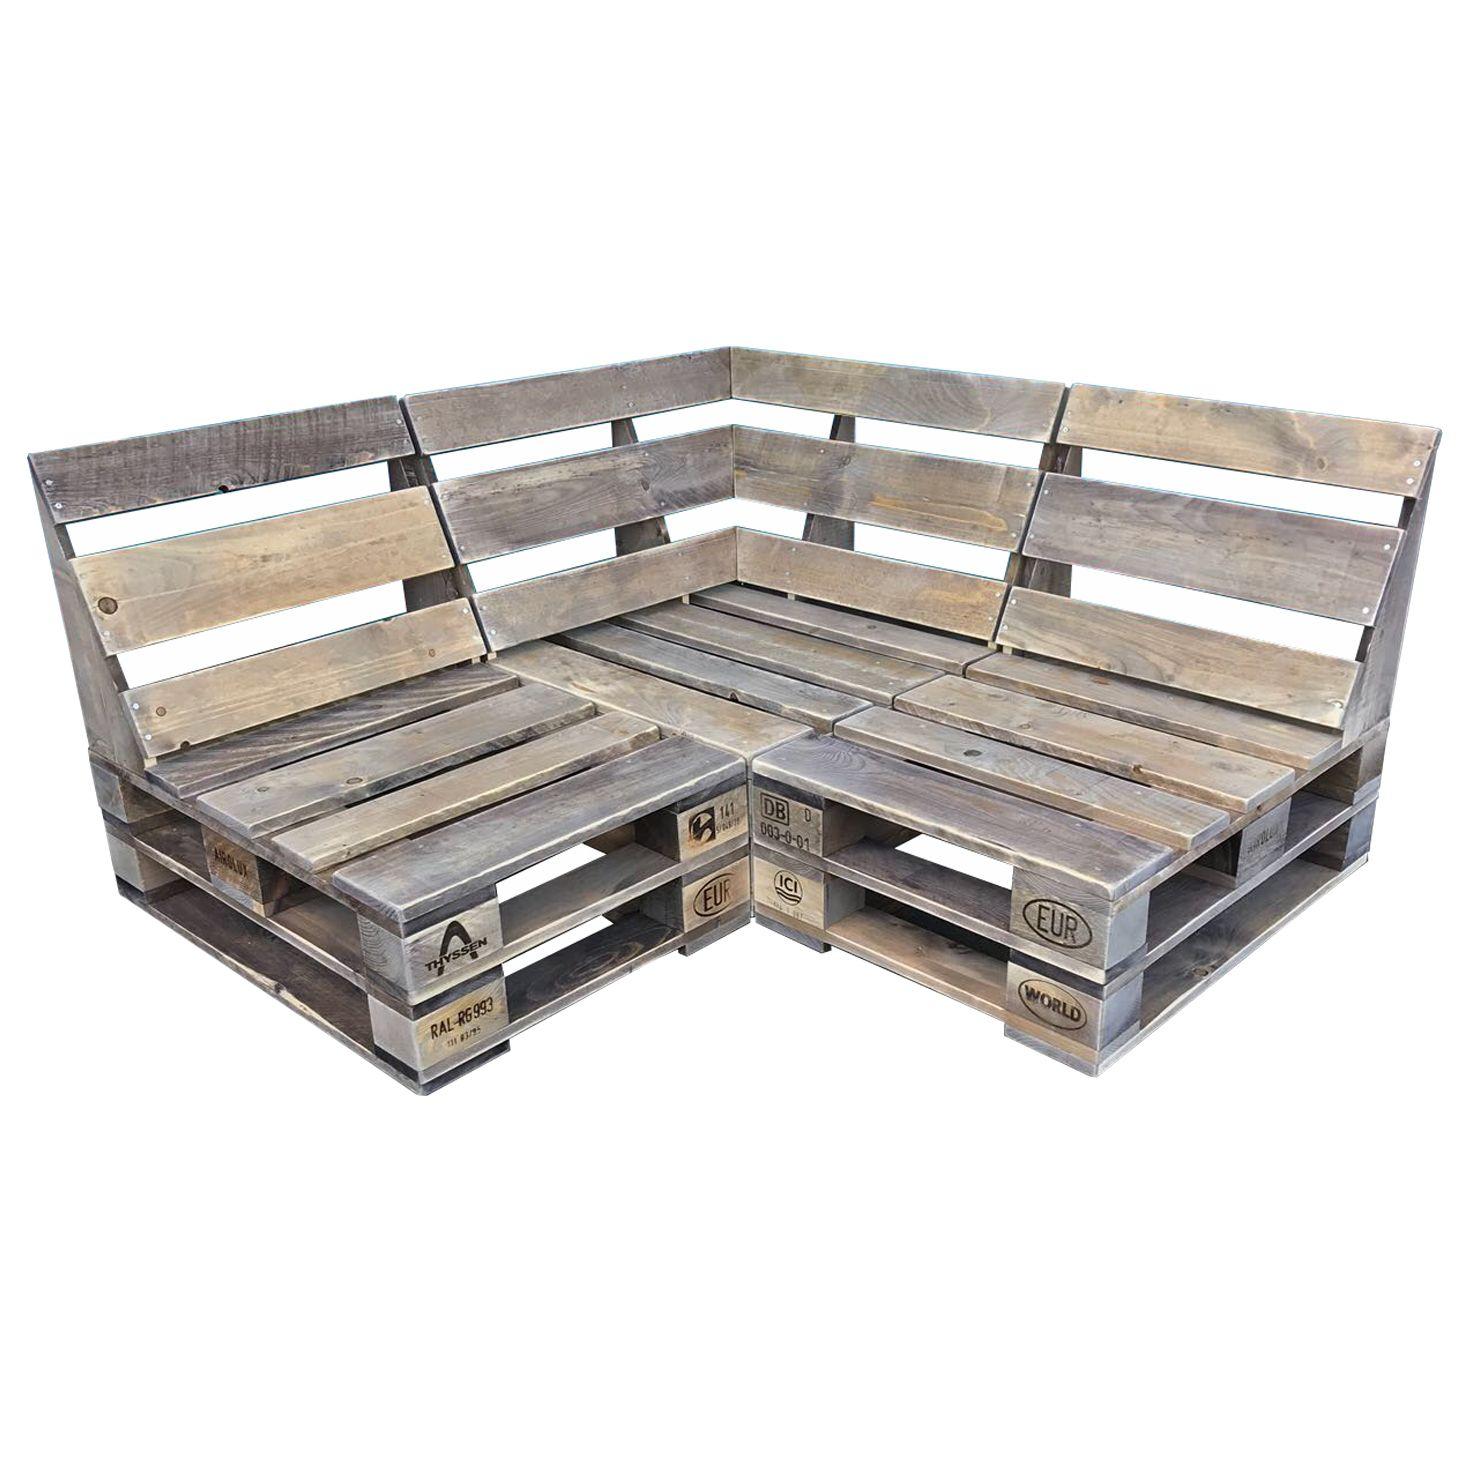 Palettenmöbel: Lounge-Sofa Kombination Sixty-COMFY-COZY 140 cm x 140 cm  / T=80 cm / H=76 / Sitzhöhe =35 (cm) lieferbar auch in 200 cm x 200 cm #sofaauspalletten